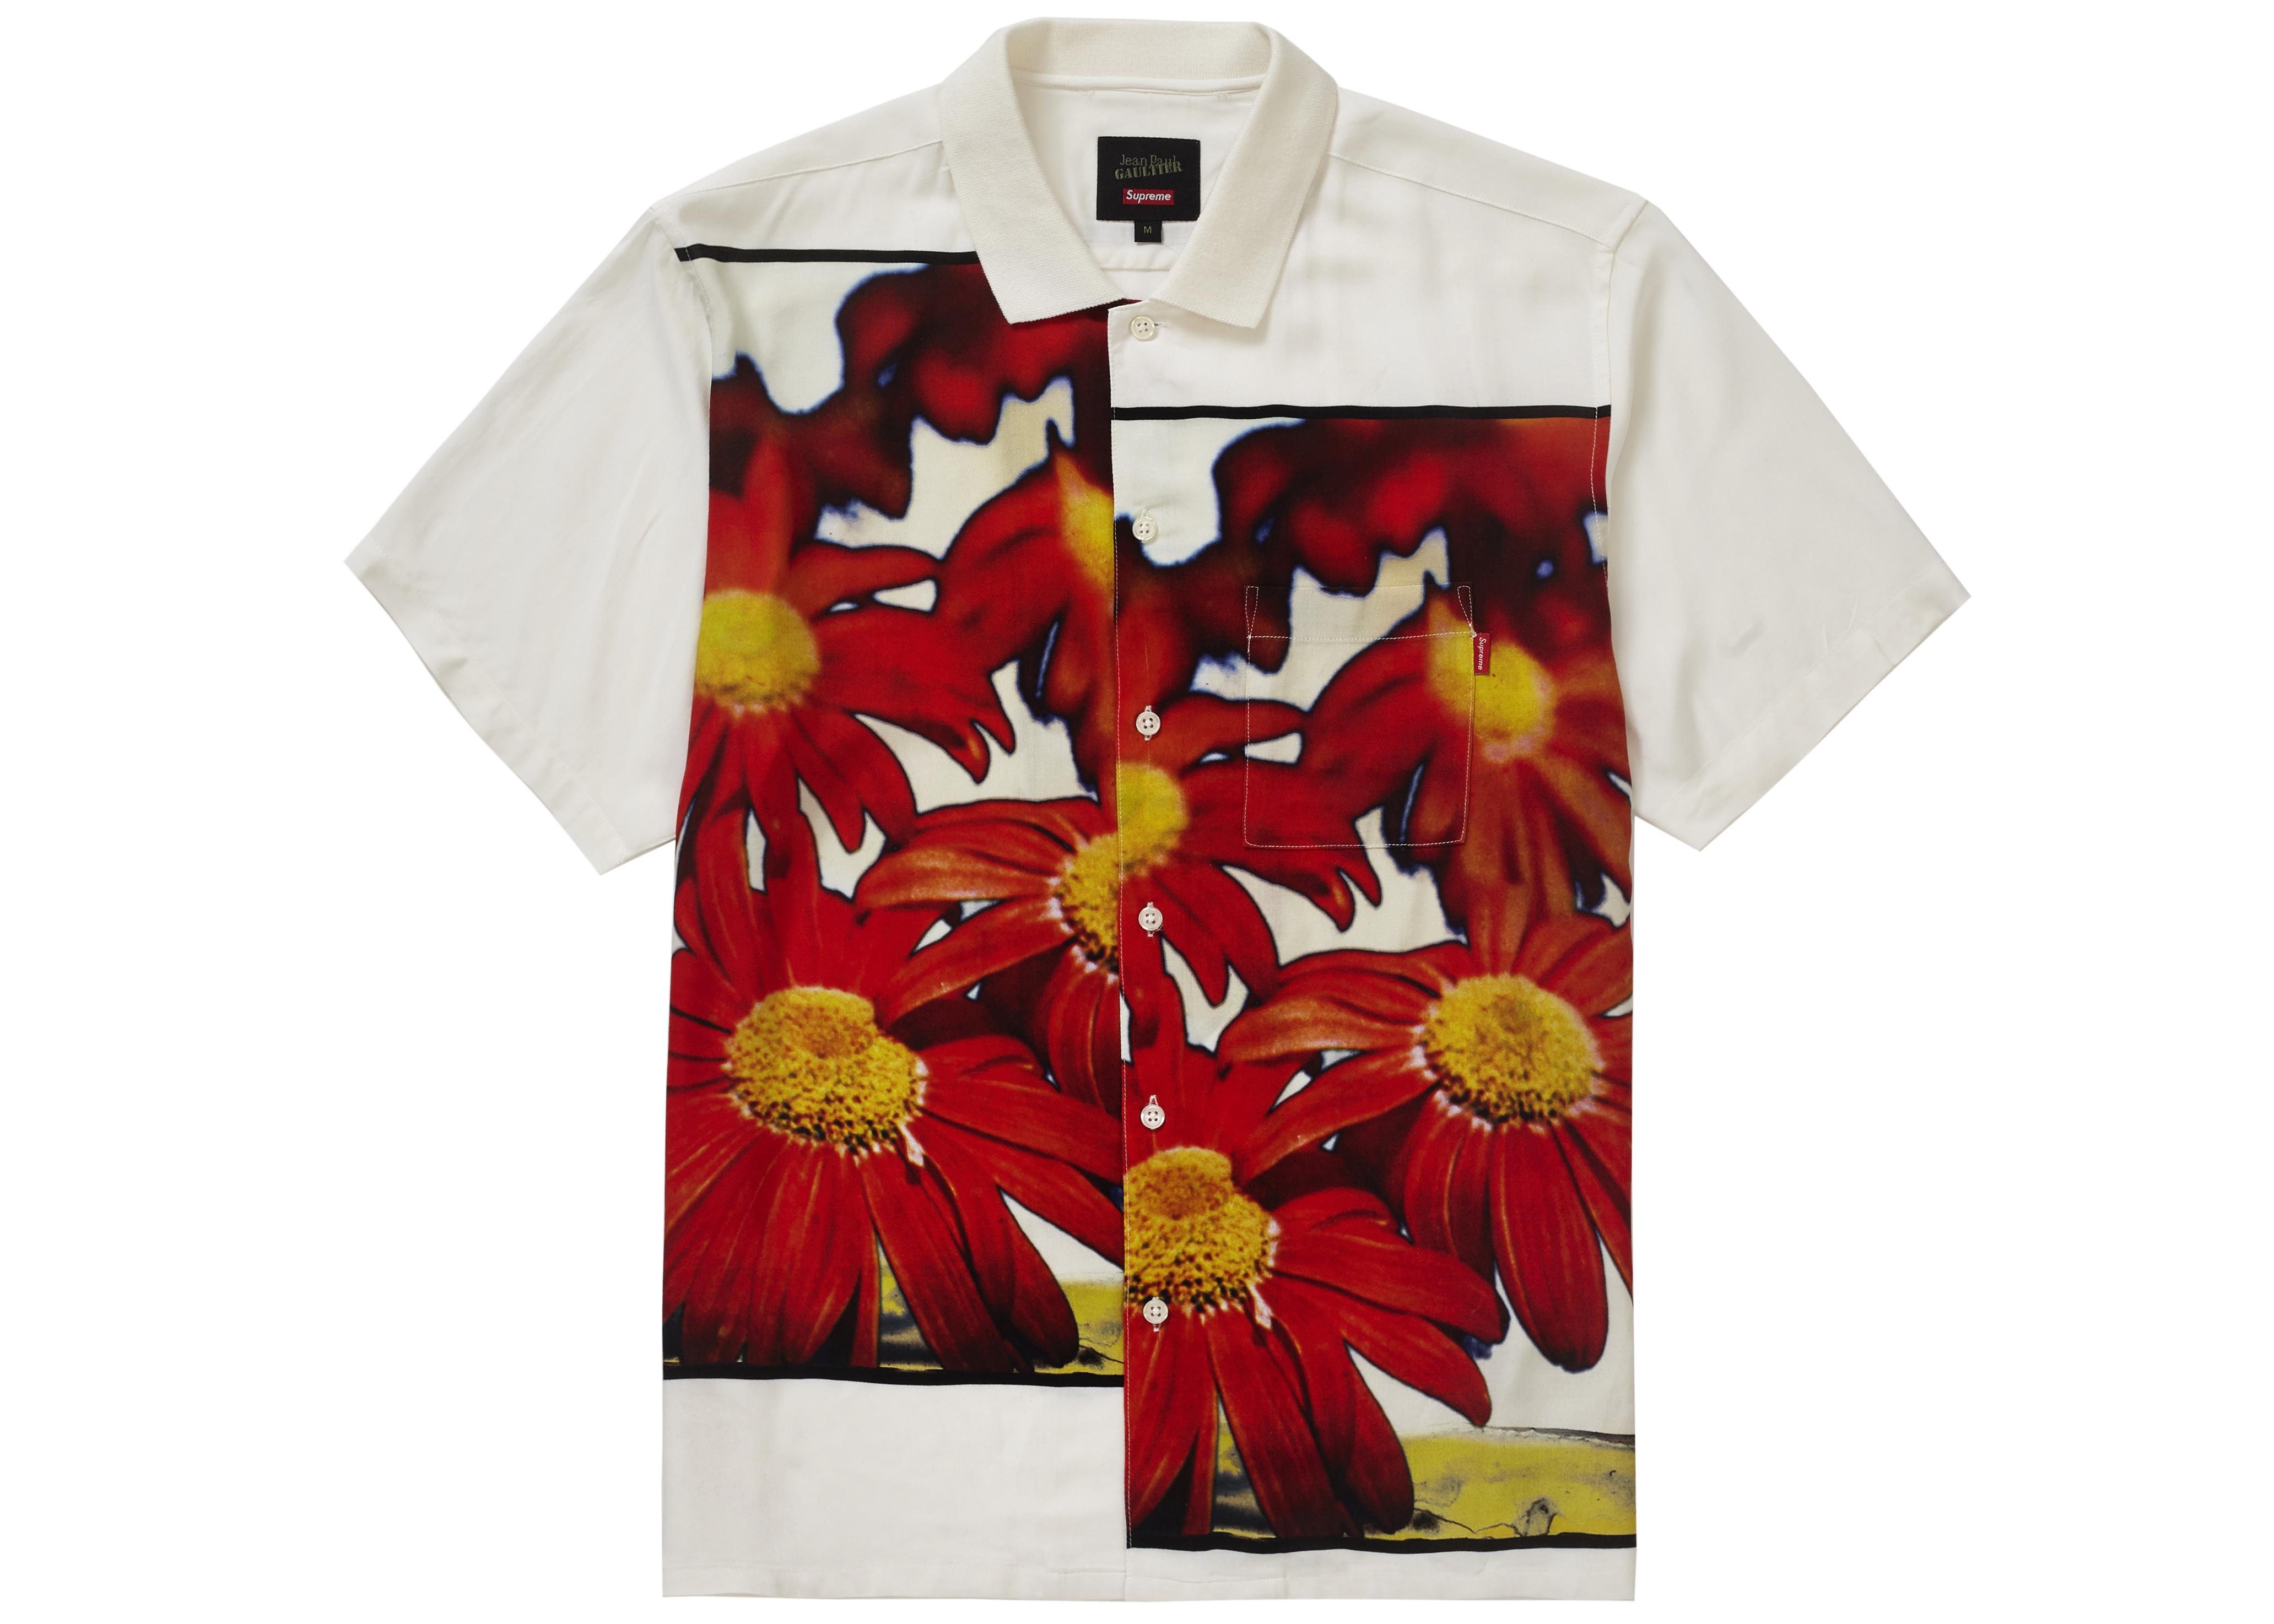 b94cad4fb7 HypeAnalyzer · Supreme Jean Paul Gaultier Flower Power Rayon Shirt White